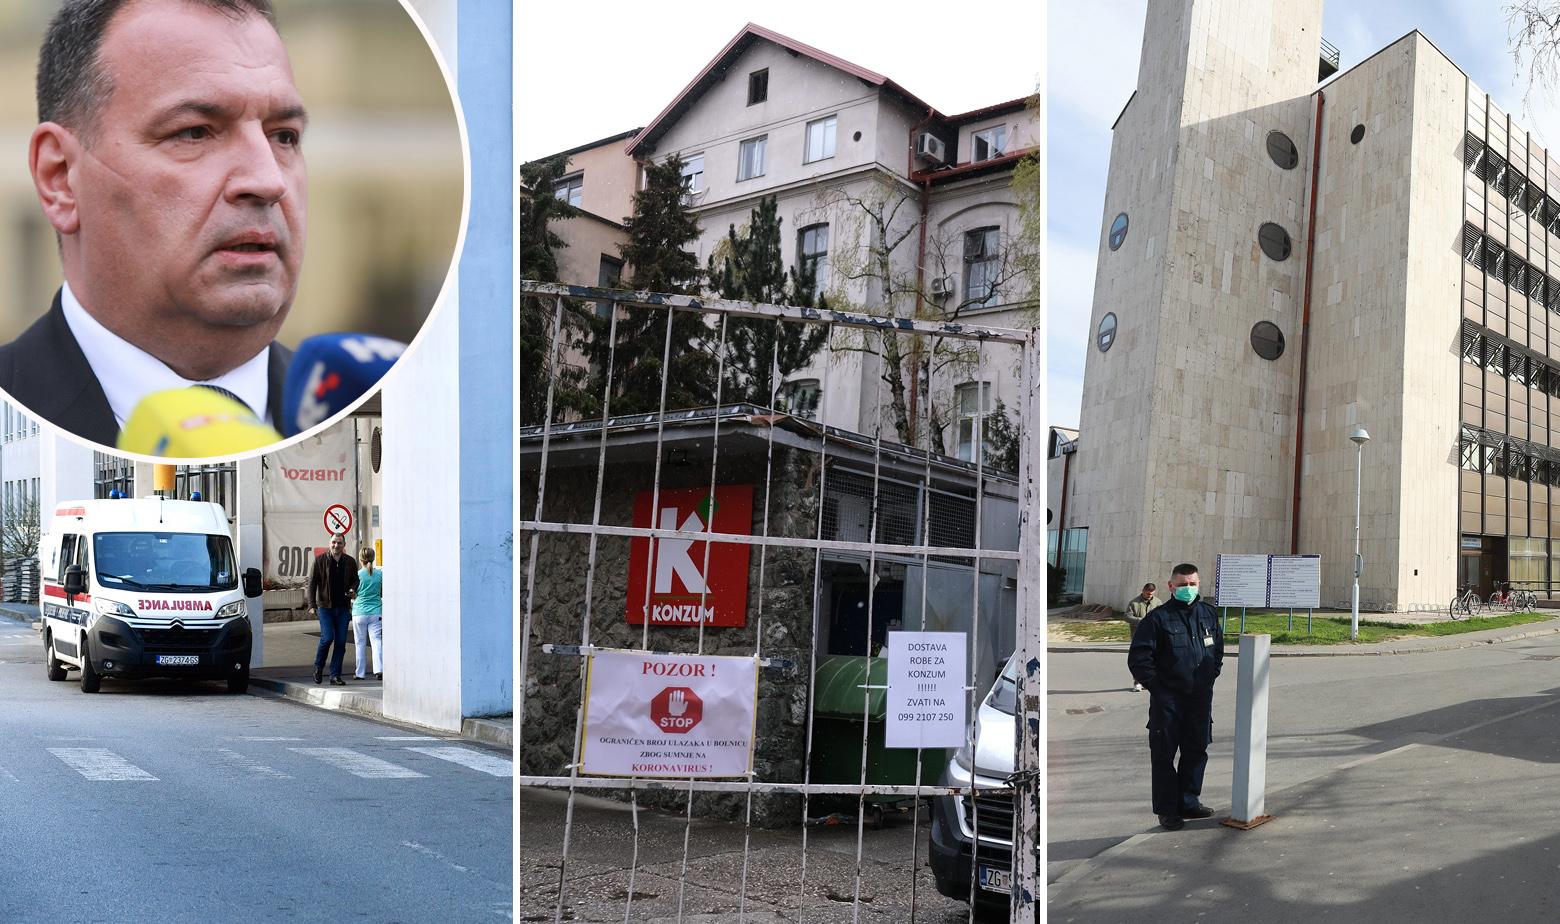 KBC Zagreb, KBC Sestre milosrdnice, KBC Osijek i Vili Beroš u krugu